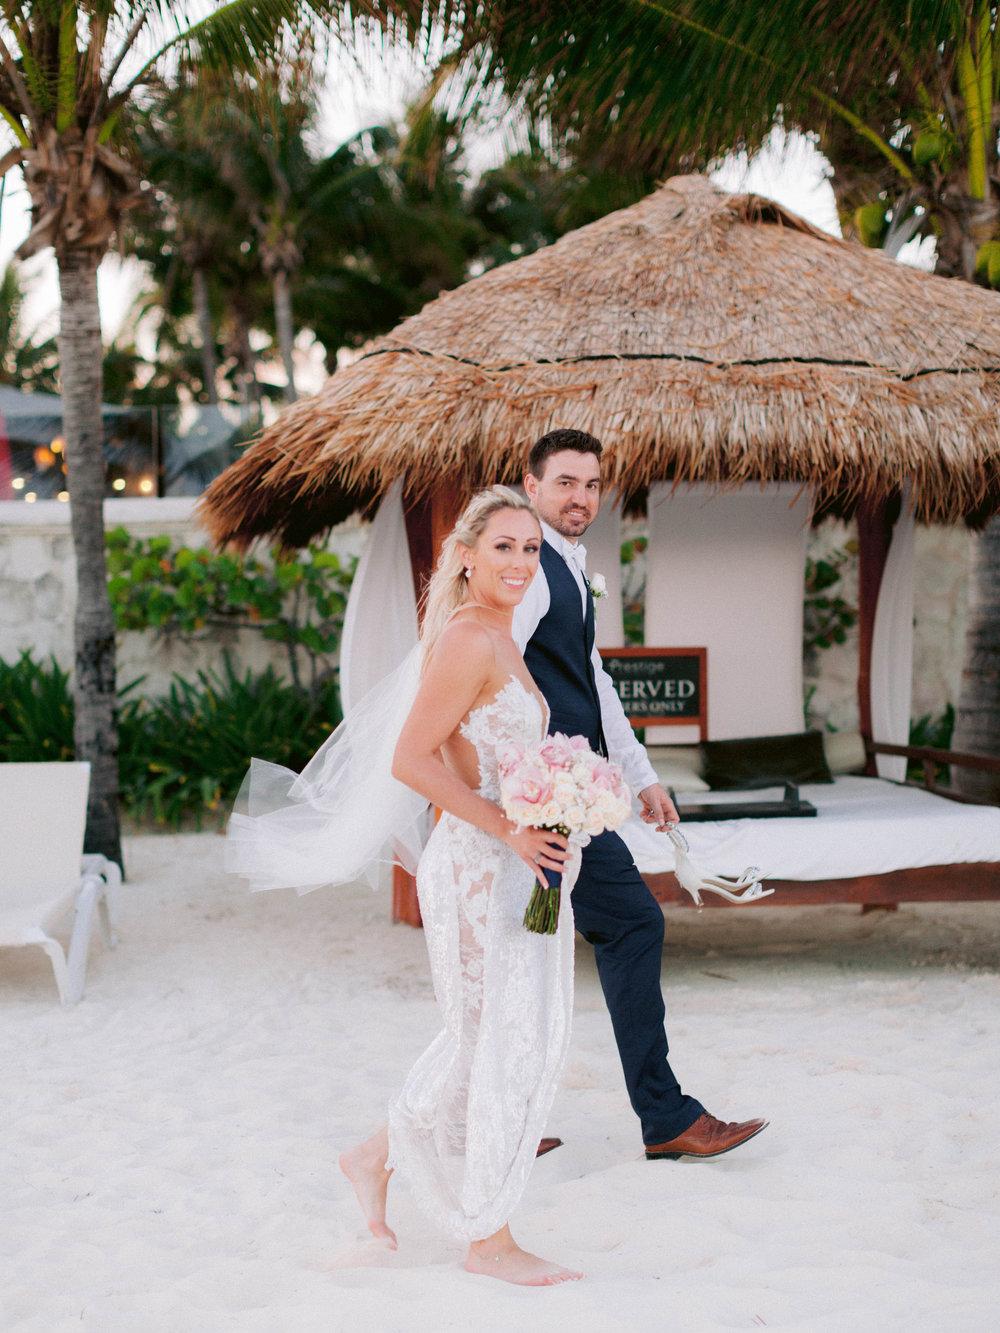 Kim_Jeff_Cancun Wedding_Portraits_Kurtz_Orpia (163 of 178).jpg